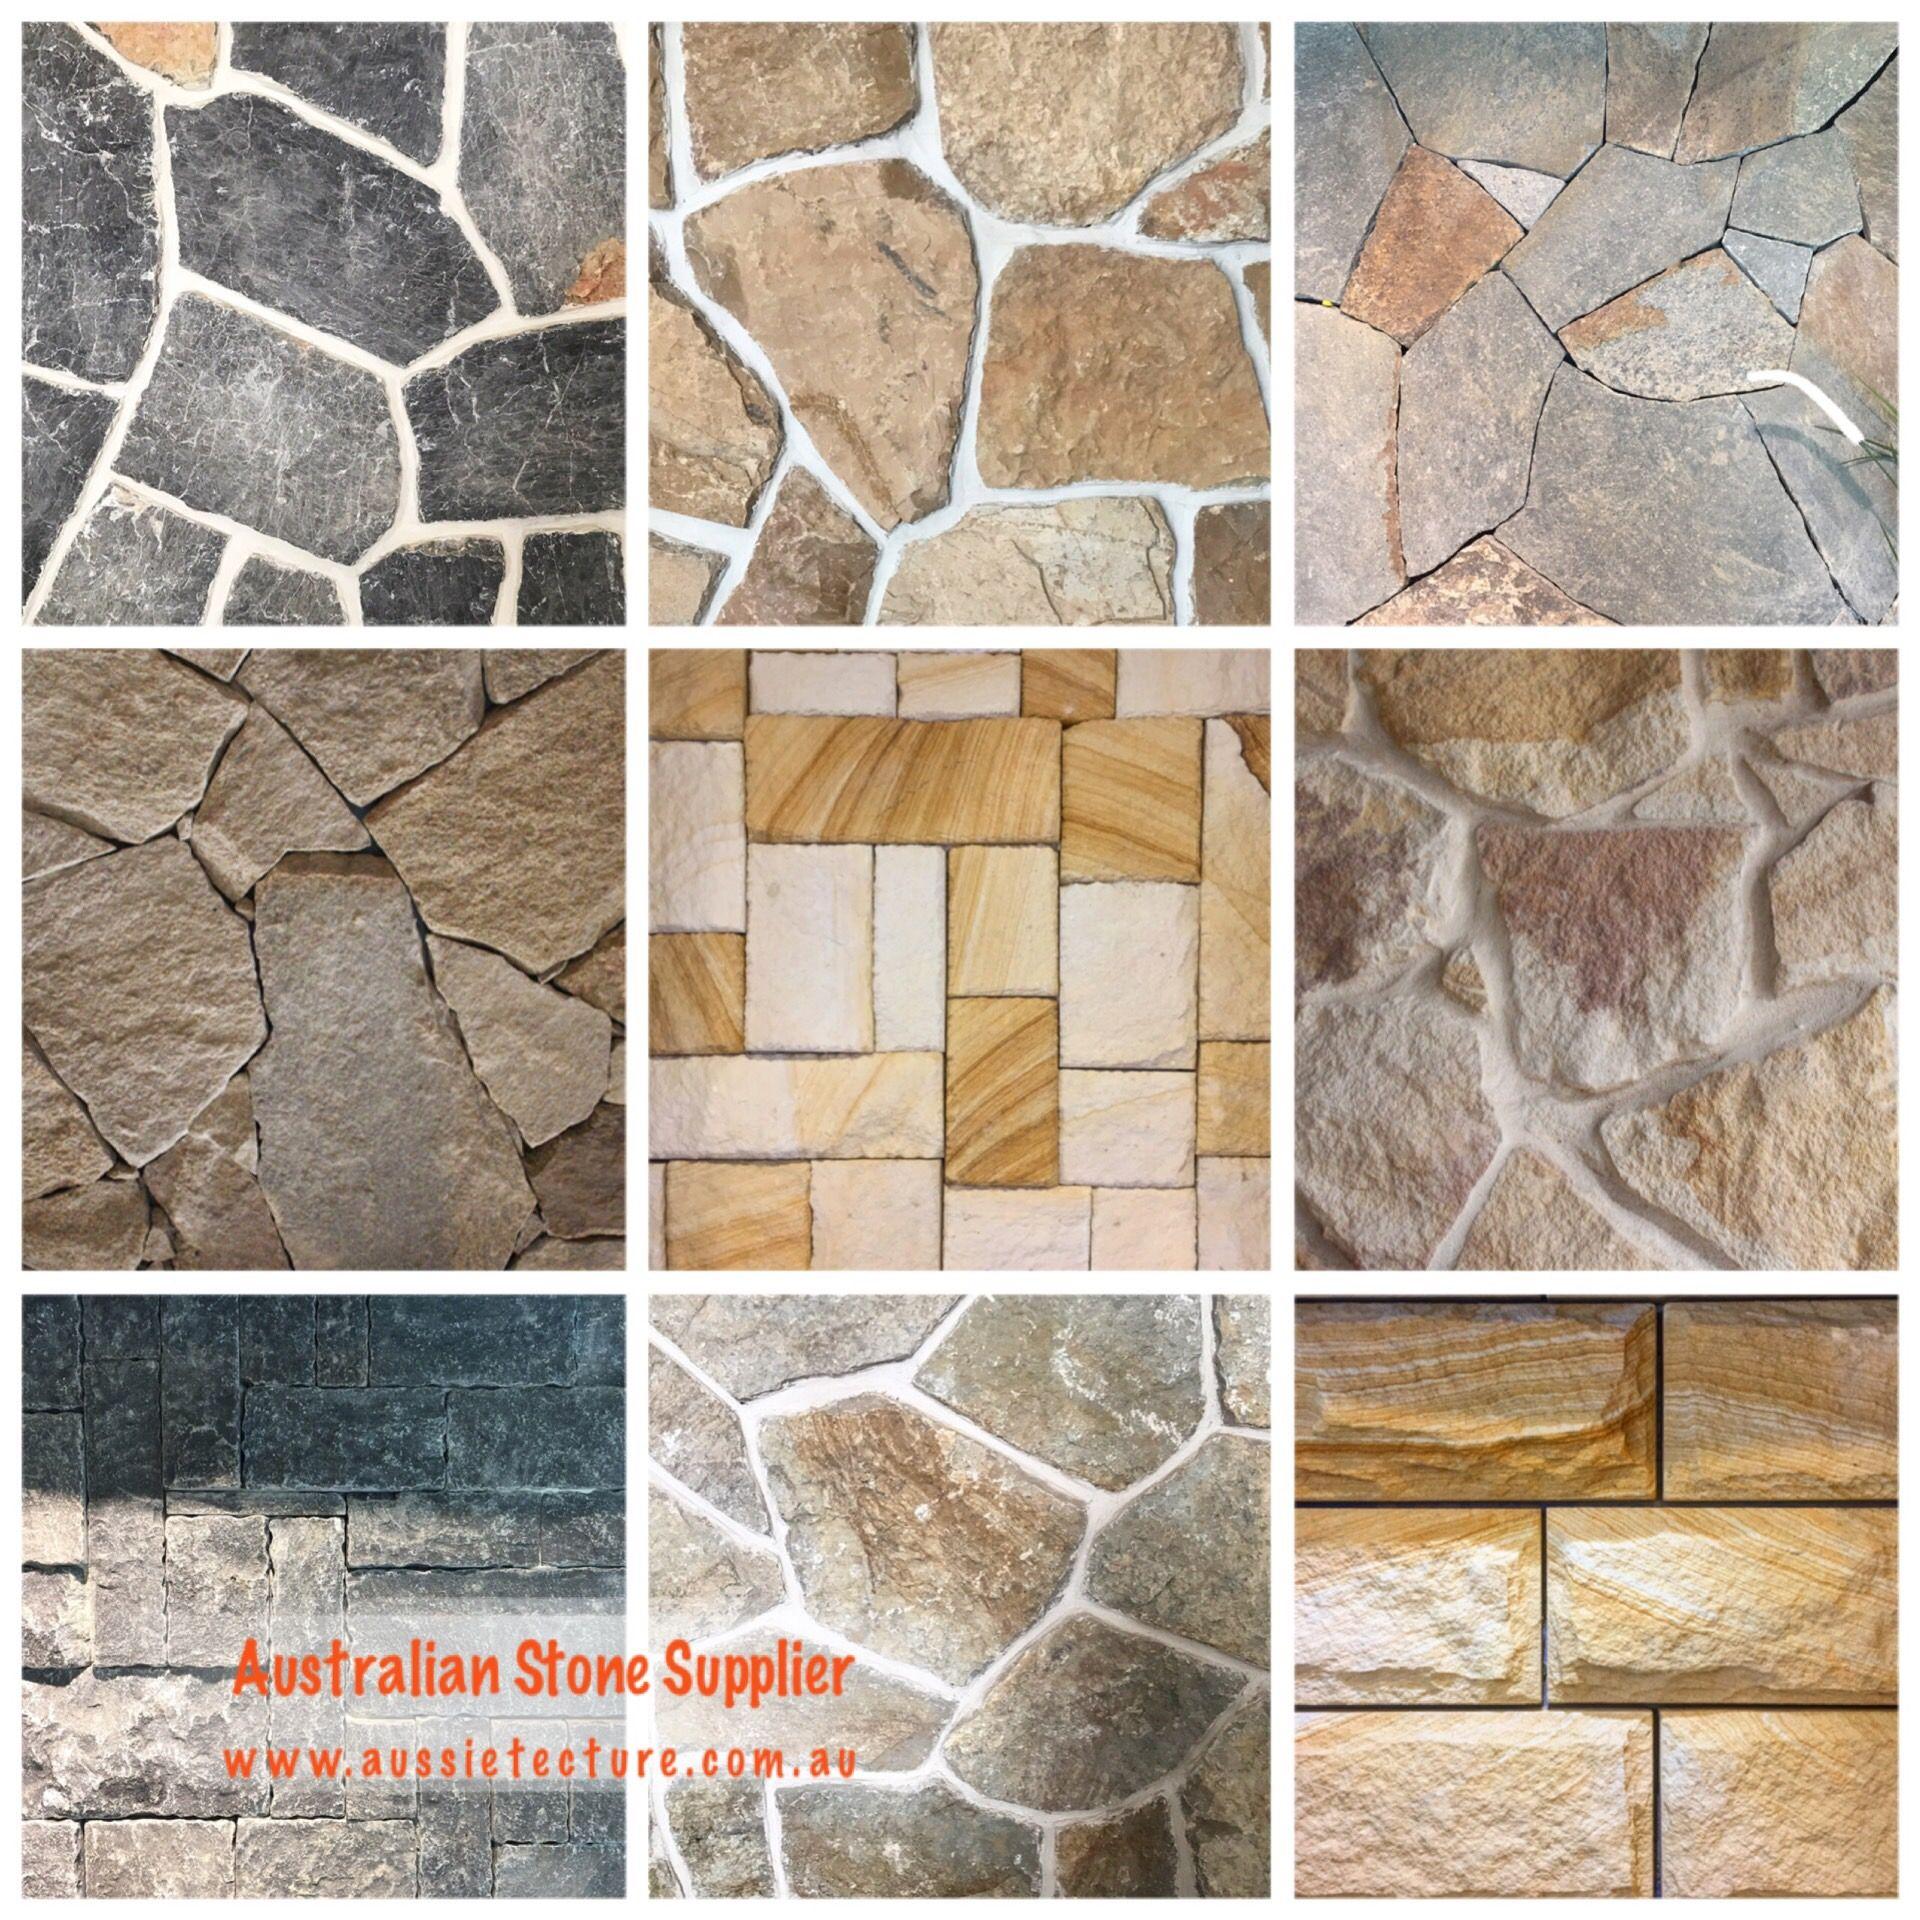 Stone Wall Stone Cladding Stone Walls Stone Walling Sone Wall Cladding Sandstone Stone Clad Stone Cladding Stone Cladding Exterior Natural Stone Cladding